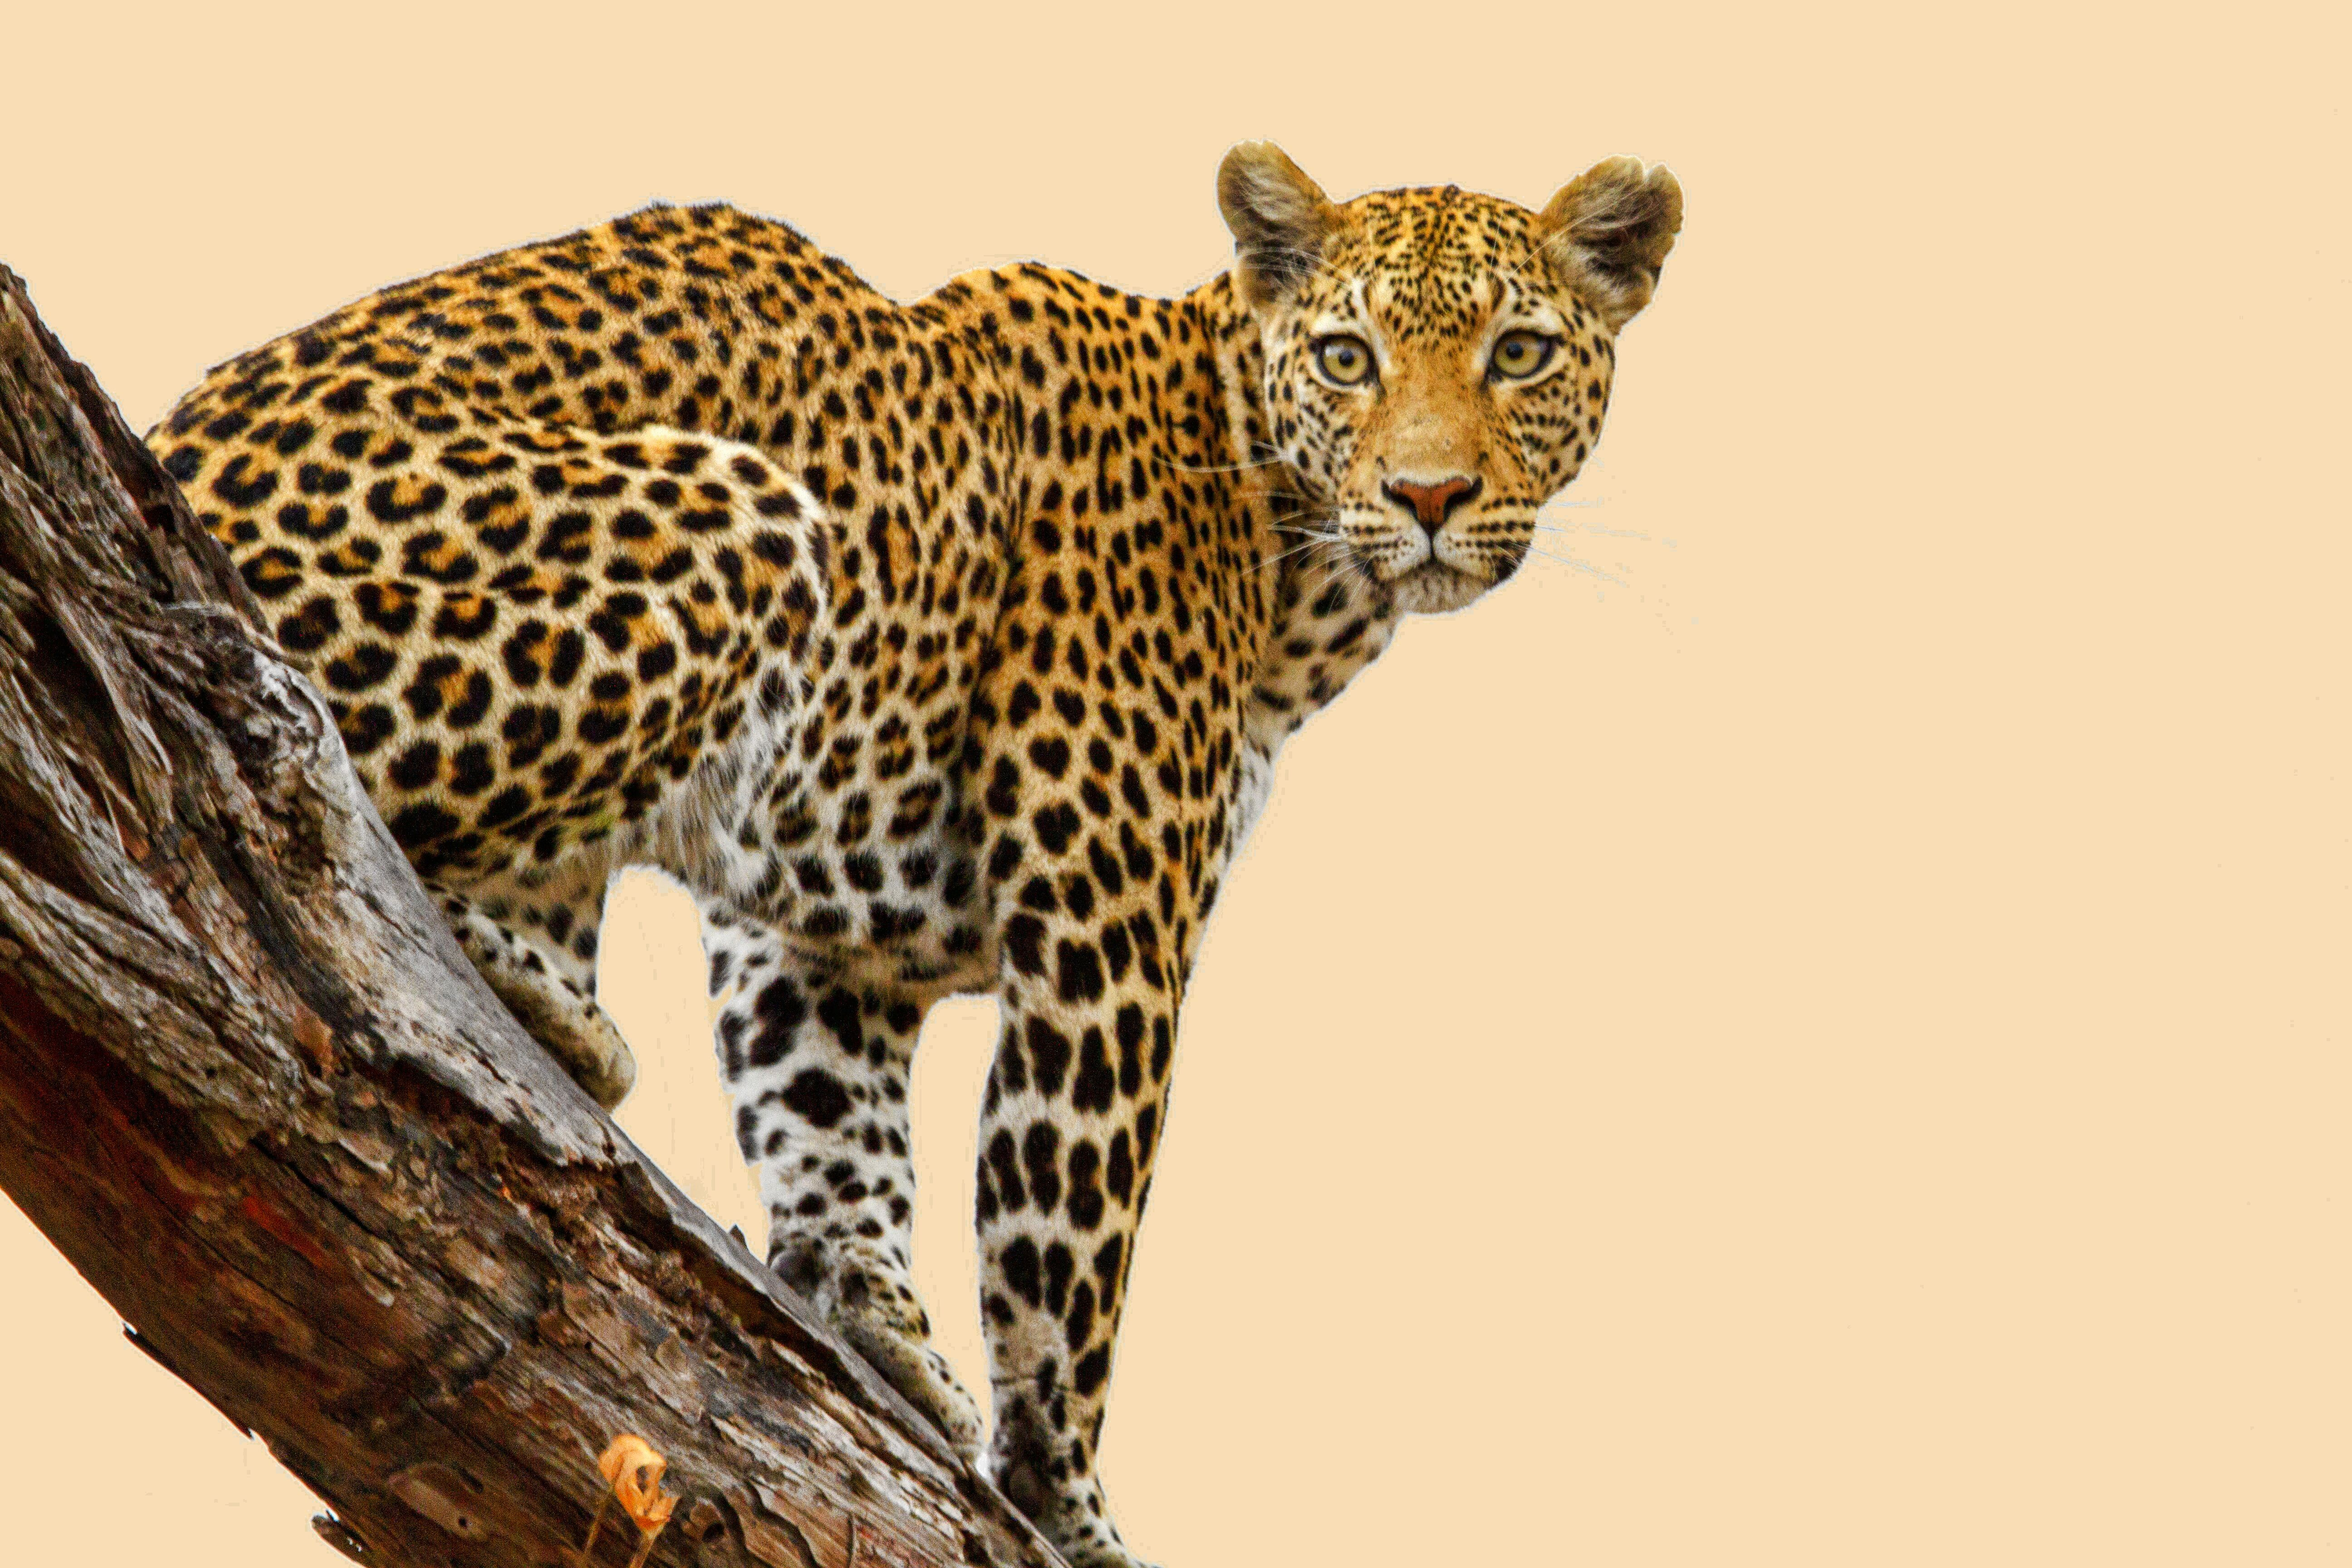 обои Leopard, леопард, хищник, животное картинки фото